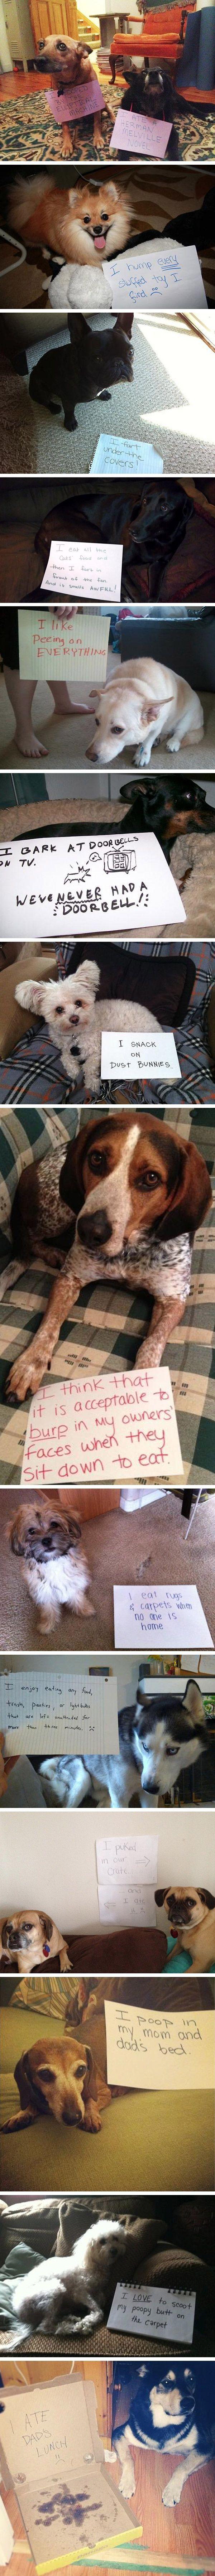 Shaming dogs.